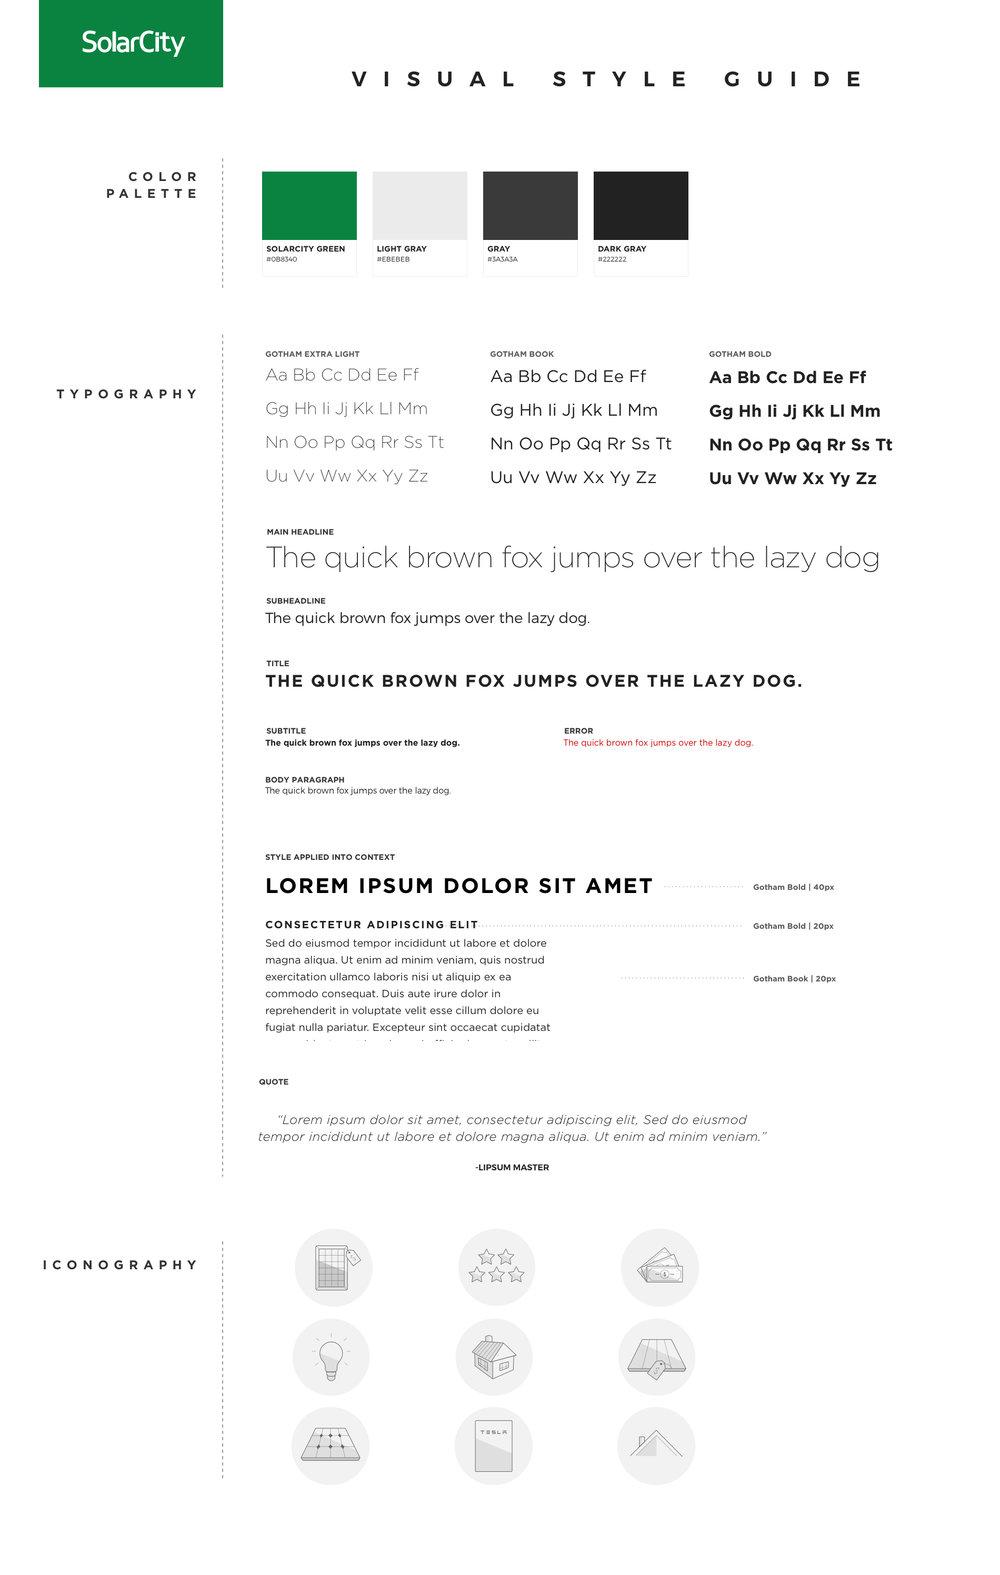 00 style guide - 1.jpg